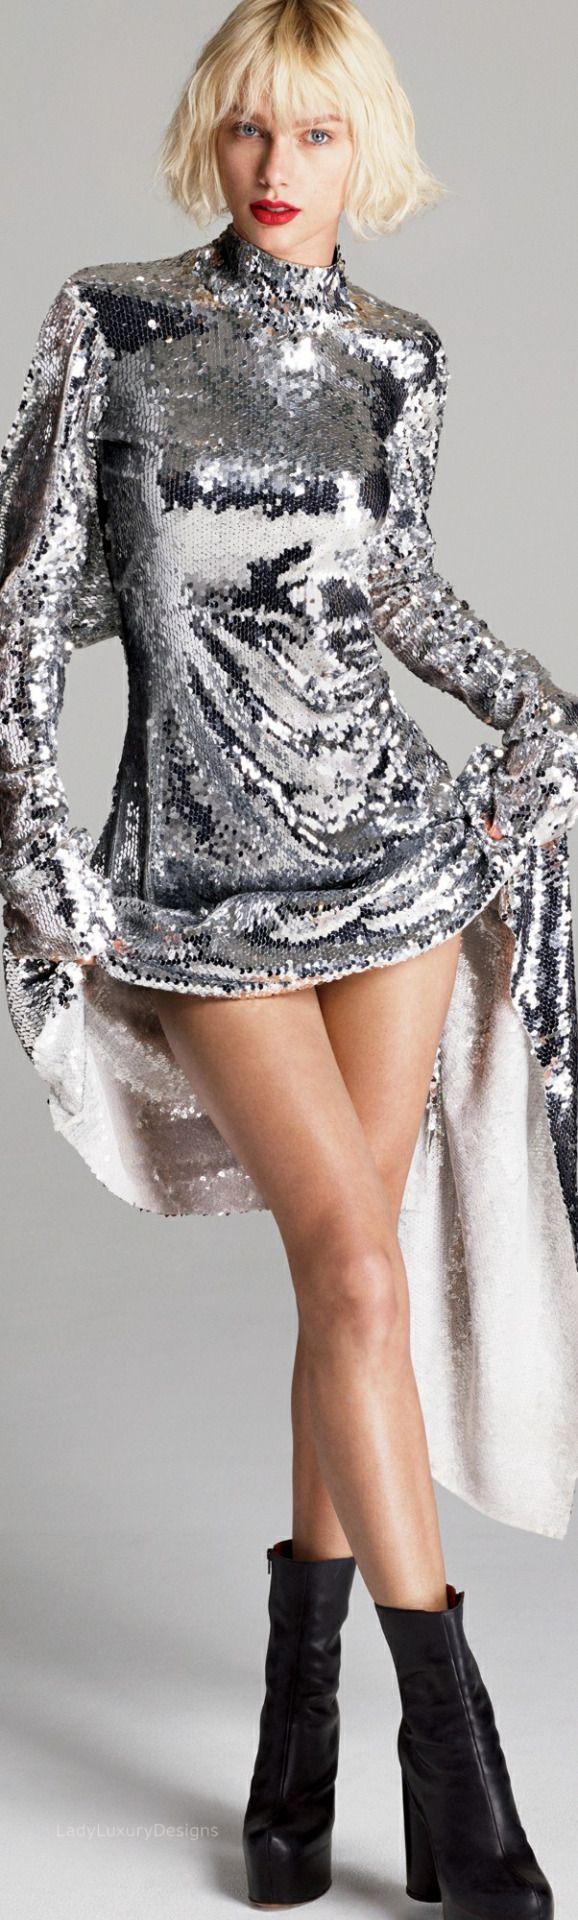 LADY LUXURY - Taylor Swift by-Mert Alas Marcus Piggott |...